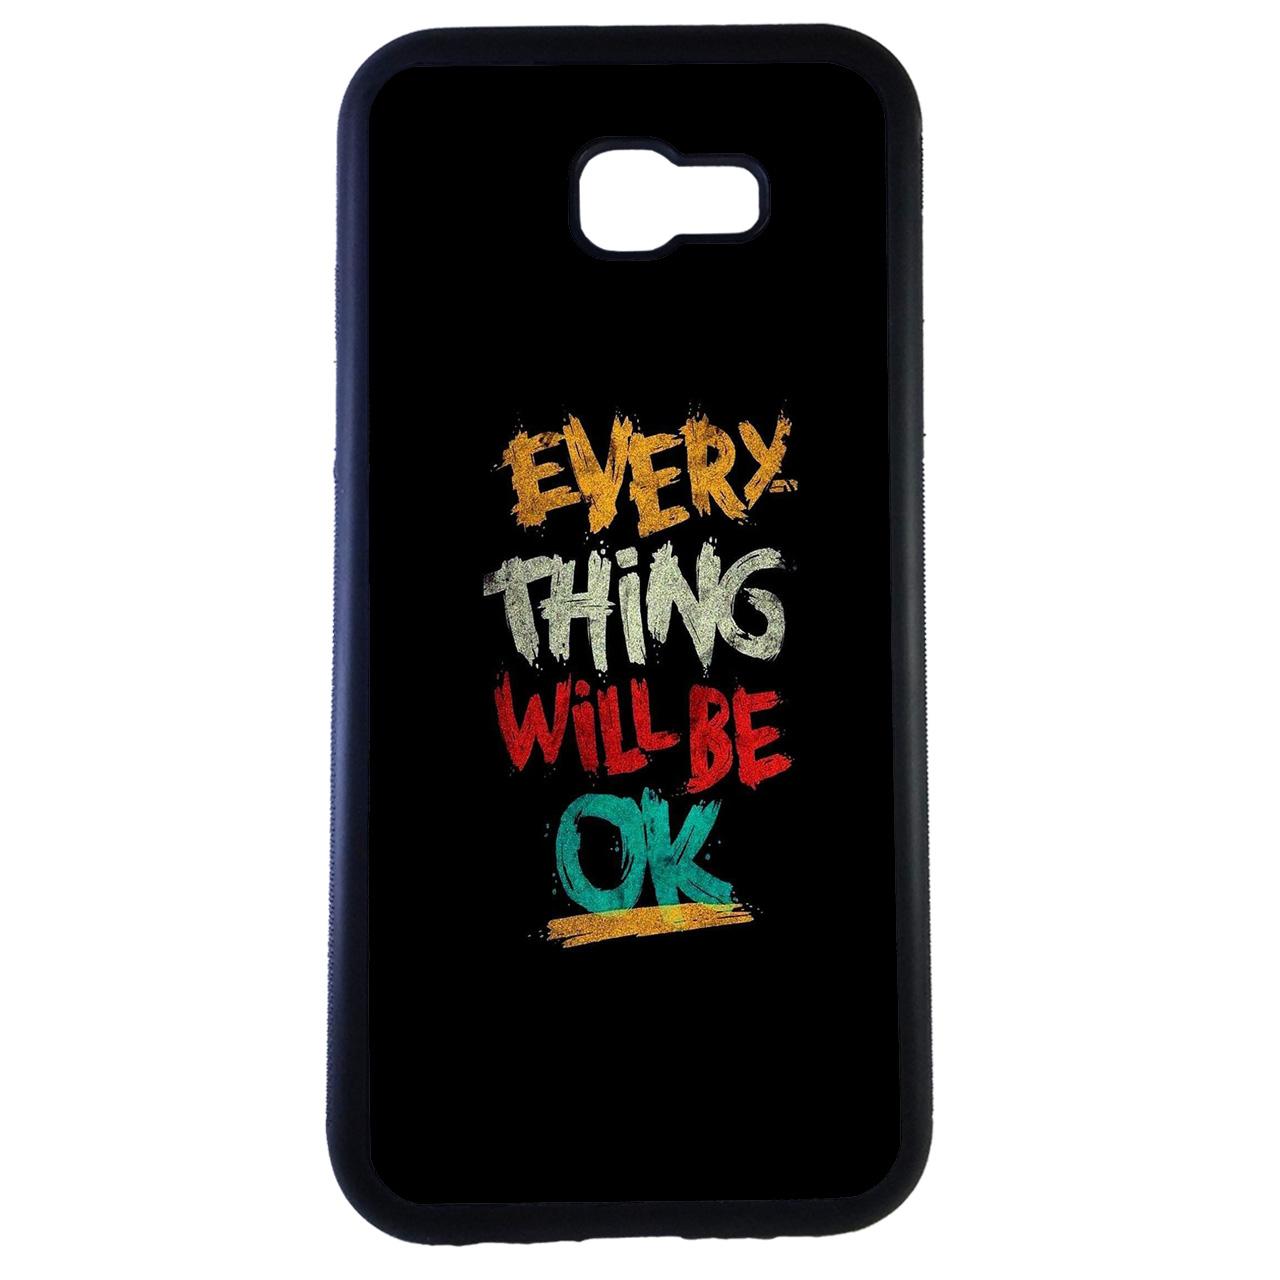 کاور طرح every thing will be ok کد 0470 مناسب برای گوشی موبایل سامسونگ Galaxy a5 2017